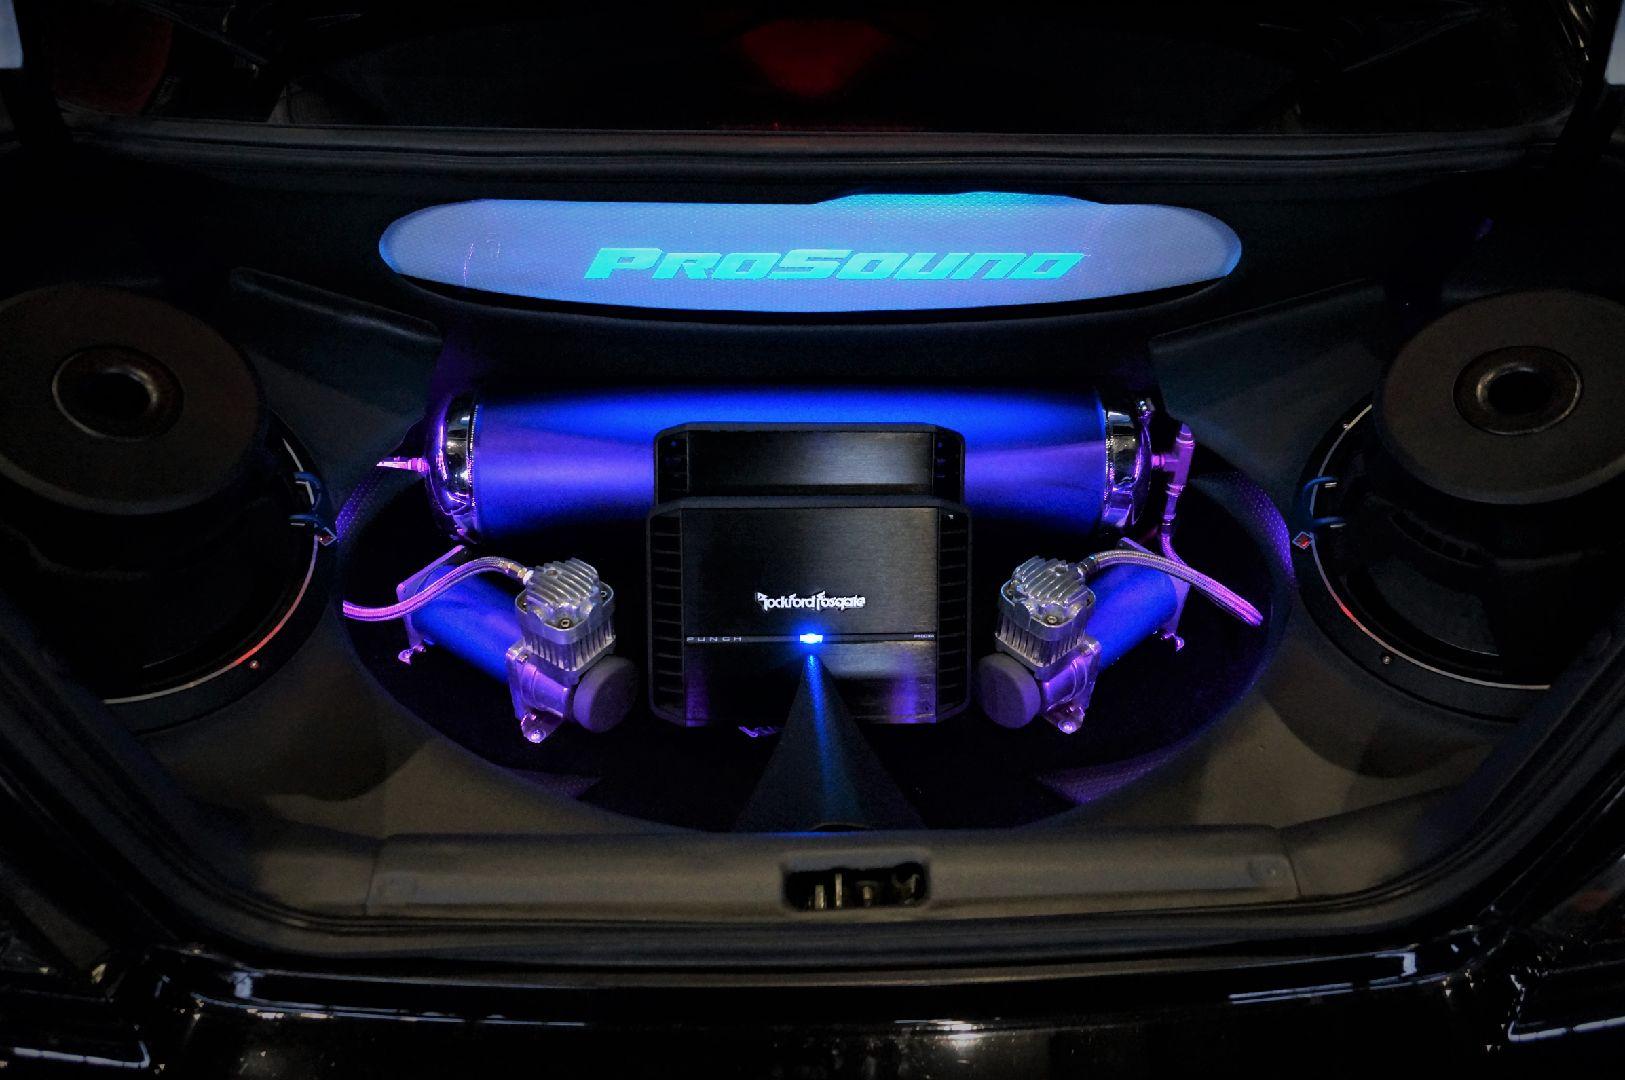 Sponsored Subaru Rockford Custom Installation - https://www.newcastleprosound.com.au/wp-content/uploads/2019/07/Photo-17-12-18-11-25-06-am.jpg